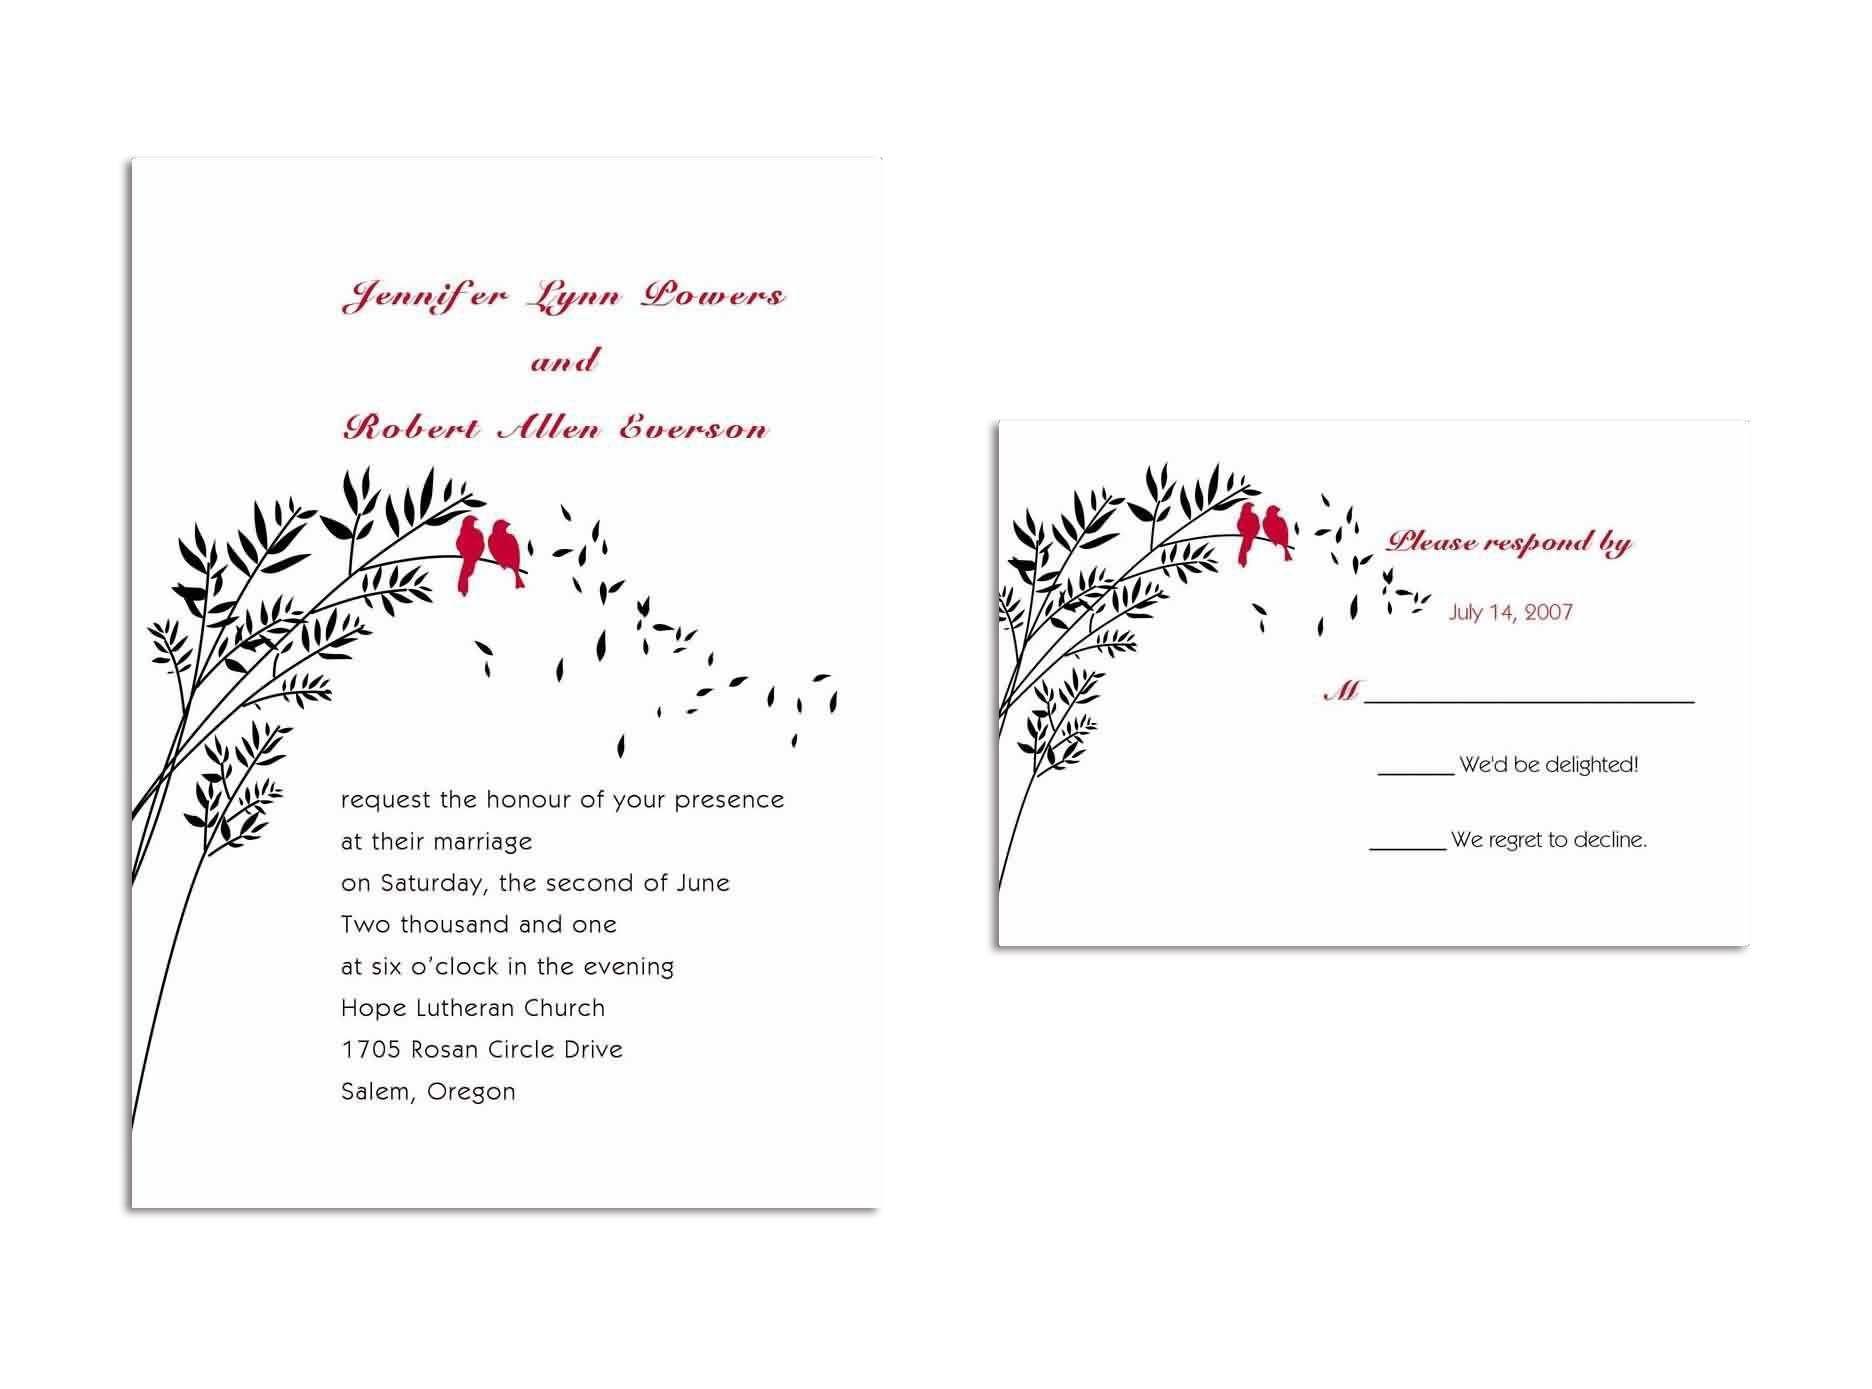 invitation-cards-printing-in-kukatpally-hyderabad | wedding ...